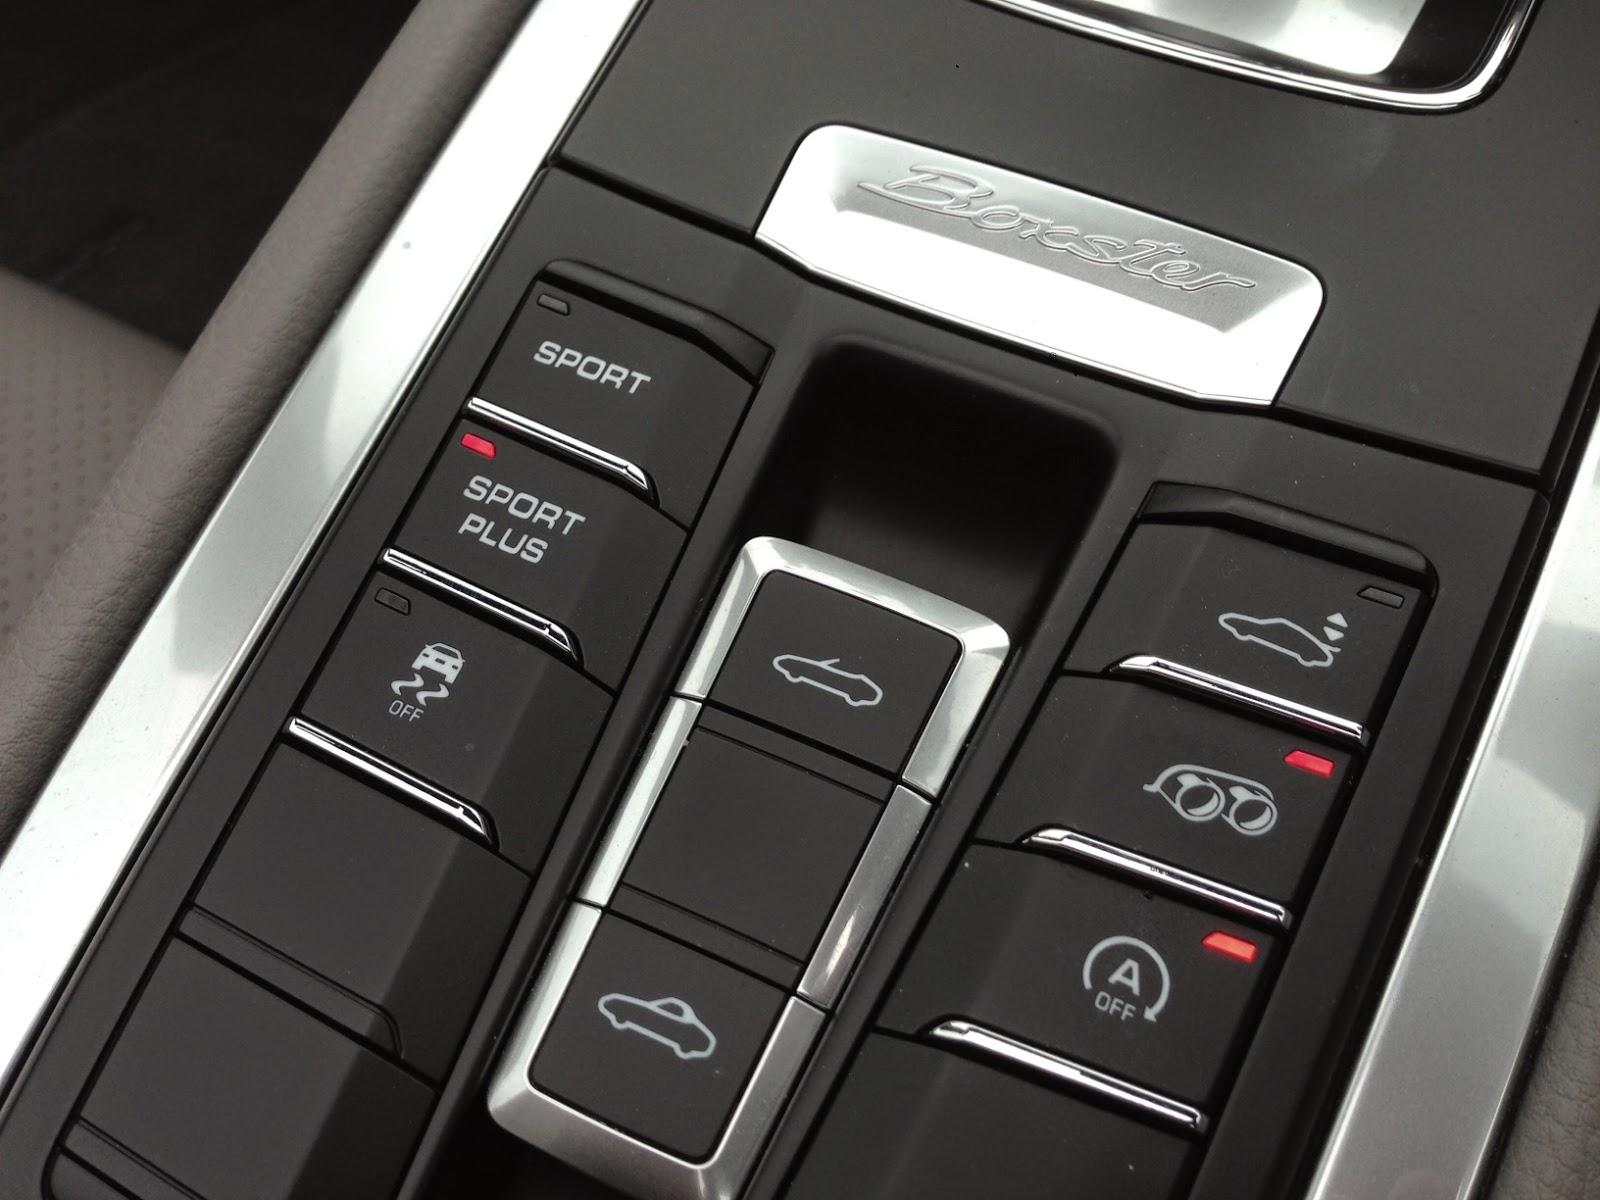 2014 Porsche Boxster S buttons